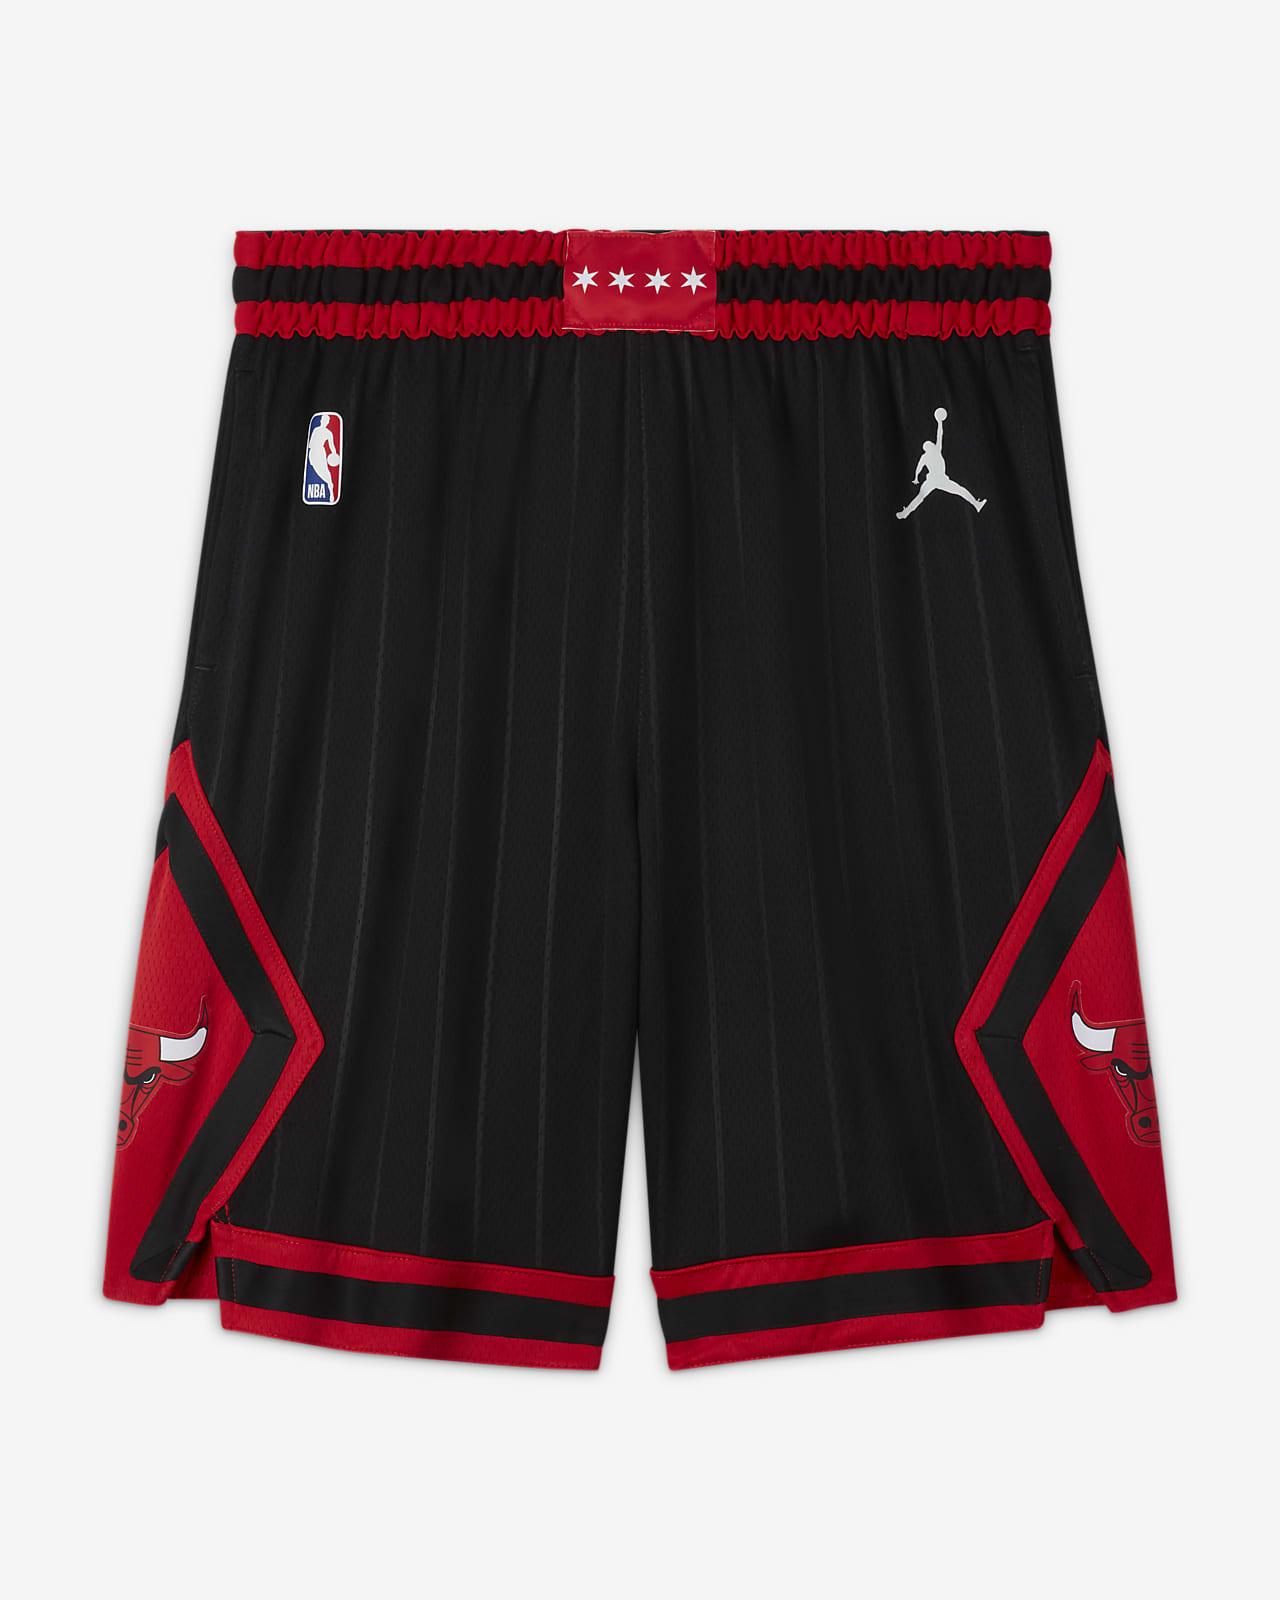 Shorts Jordan NBA Swingman para hombre Bulls Statement Edition 2020